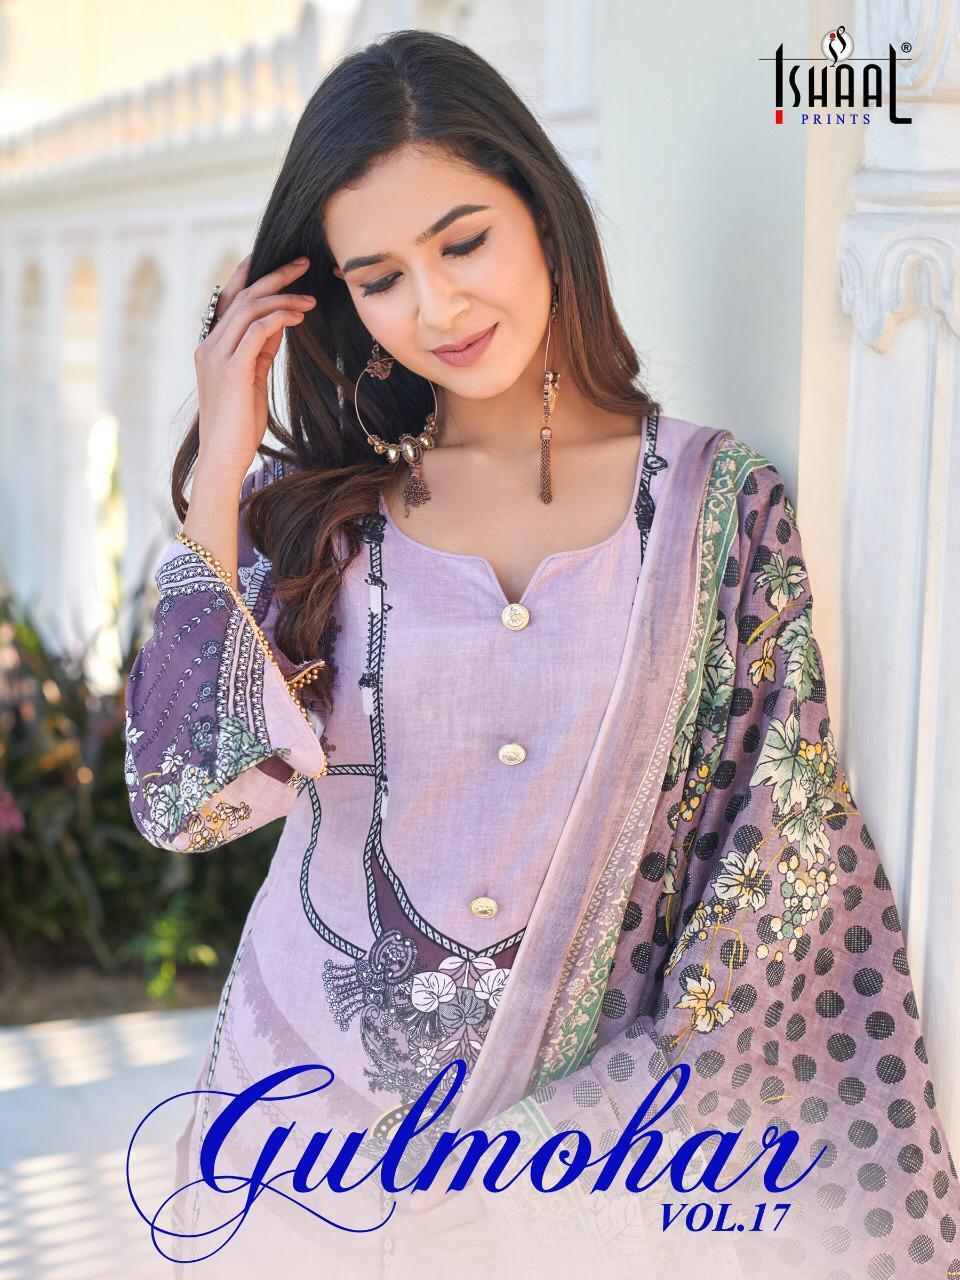 Ishaal Gulmohar Vol 17 Salwar Suit Wholesale Catalog 10 Pcs 9 - Ishaal Gulmohar Vol 17 Salwar Suit Wholesale Catalog 10 Pcs